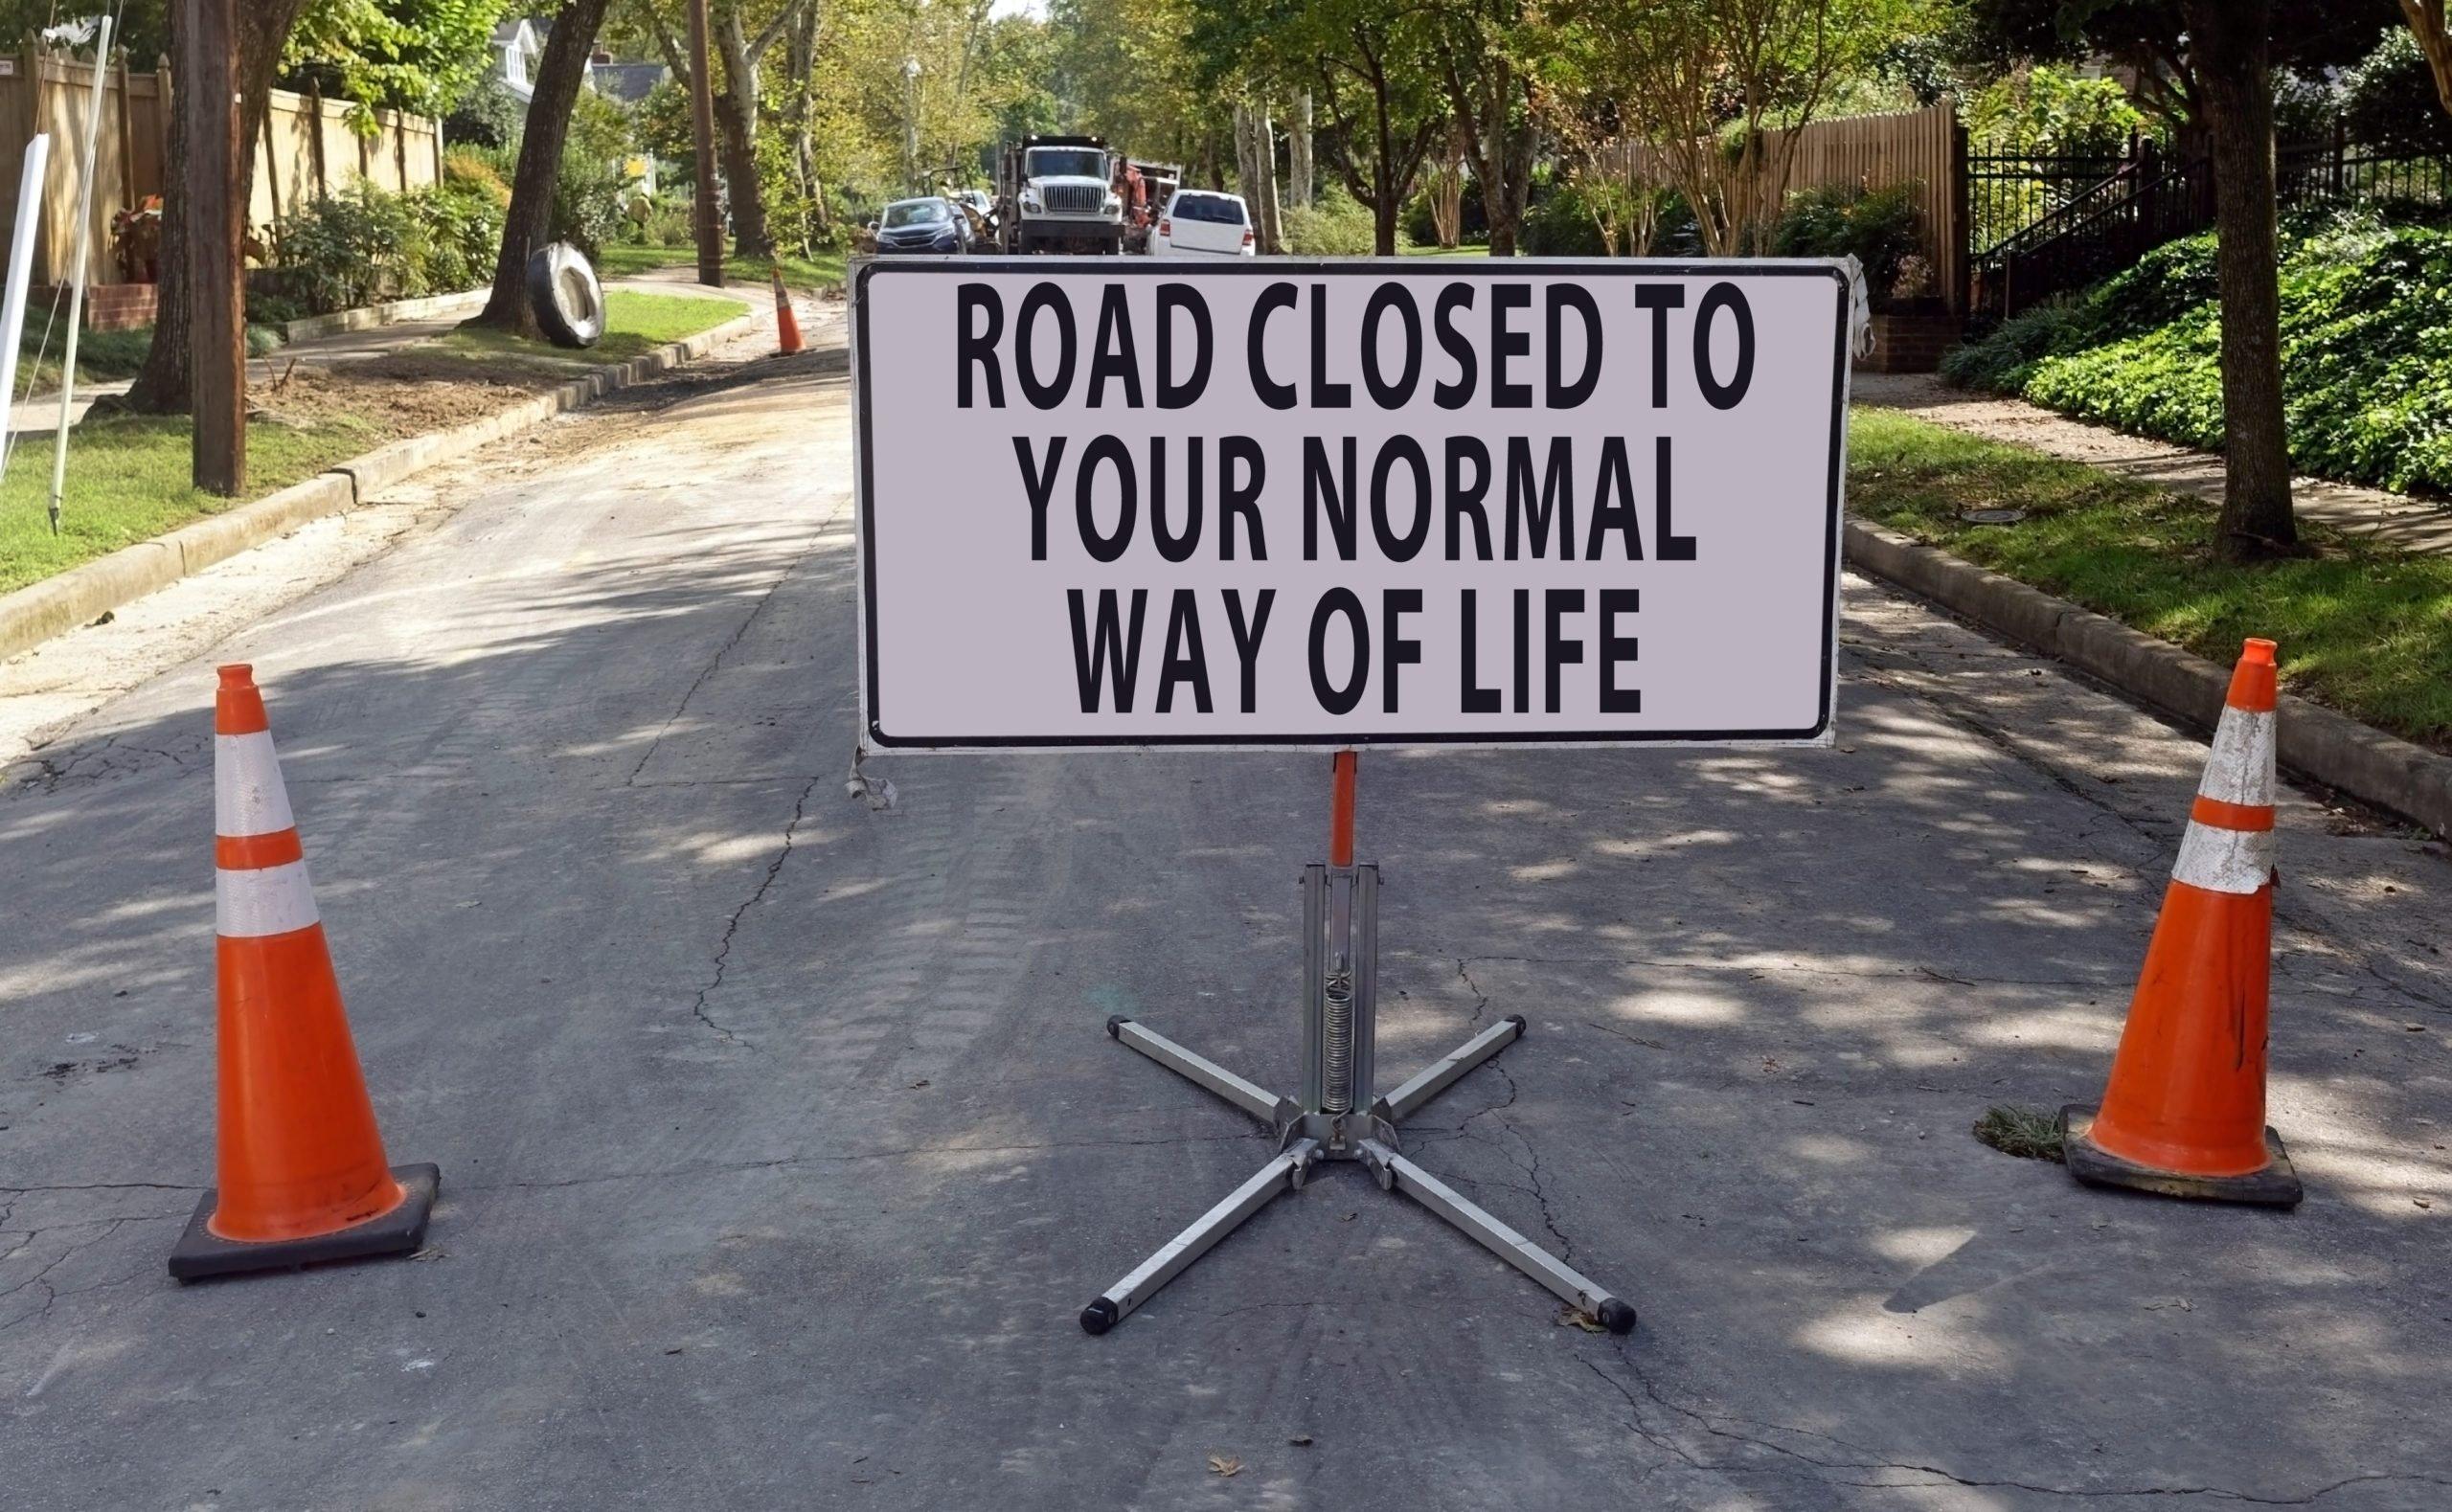 Humorous Construction Barricade